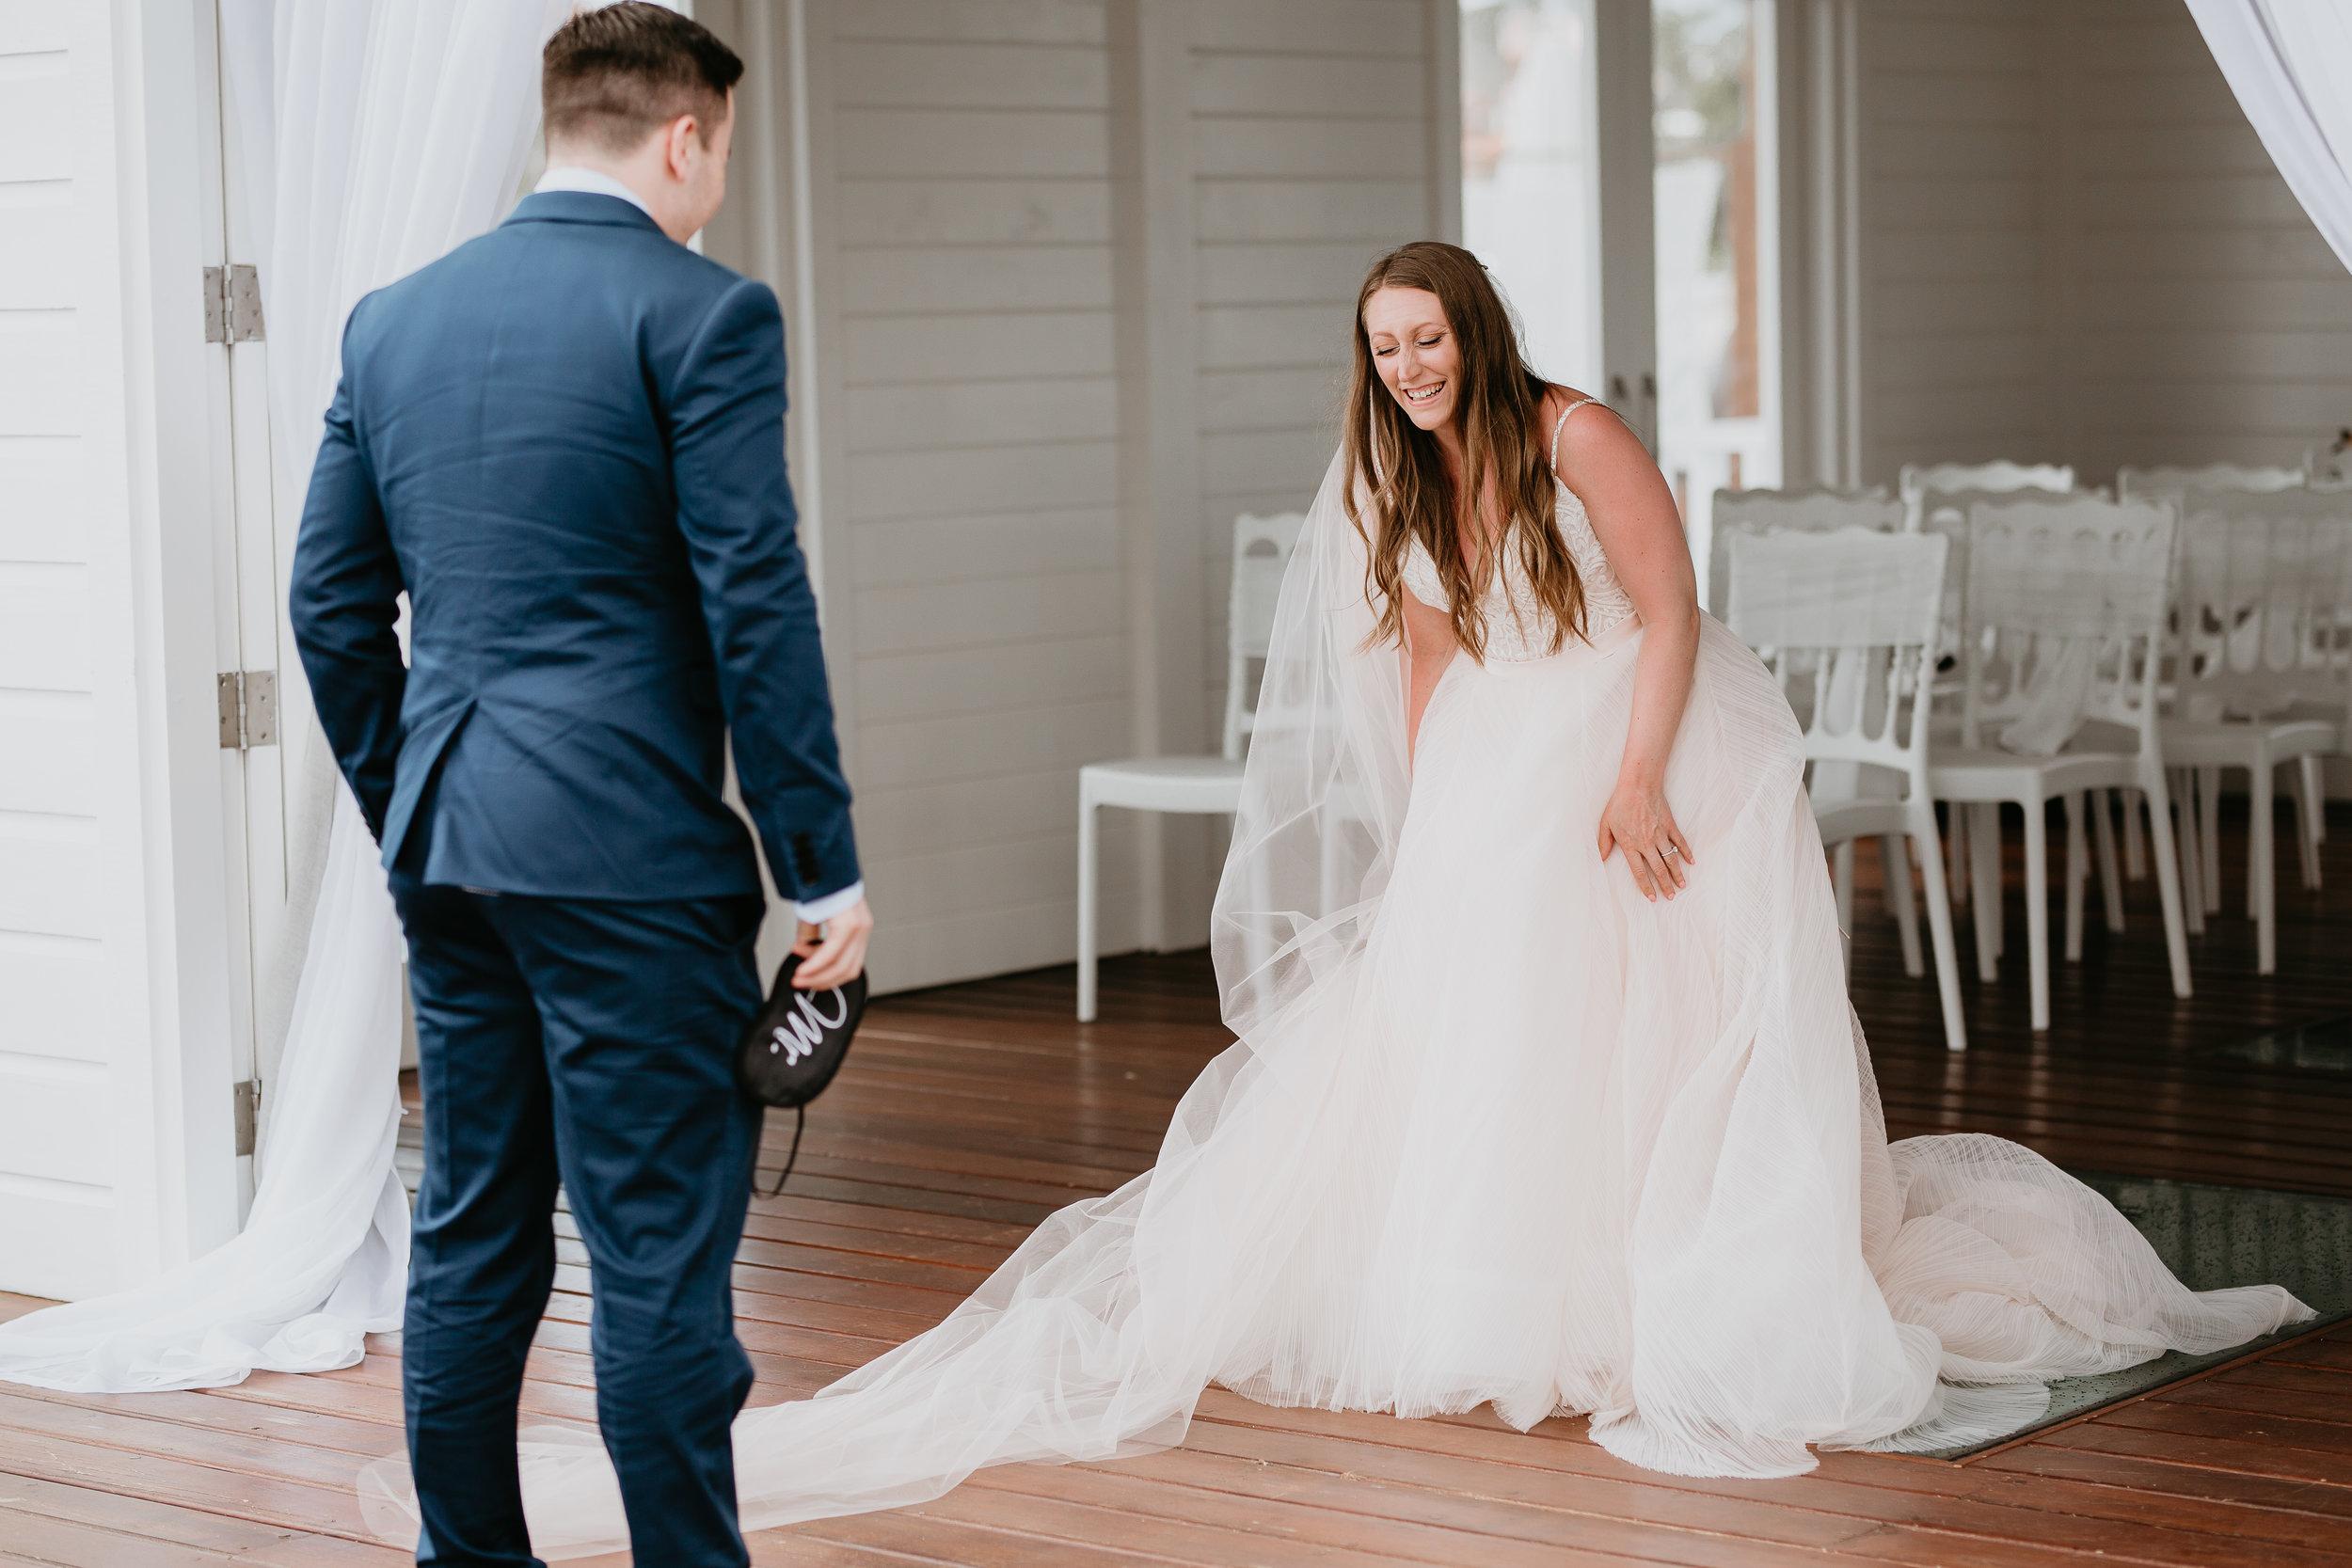 nicole-daacke-photography-destination-wedding-in-st-lucia-sandals-la-toc-intimate-island-wedding-carribean-elopement-photographer-chill-island-wedding-30.jpg